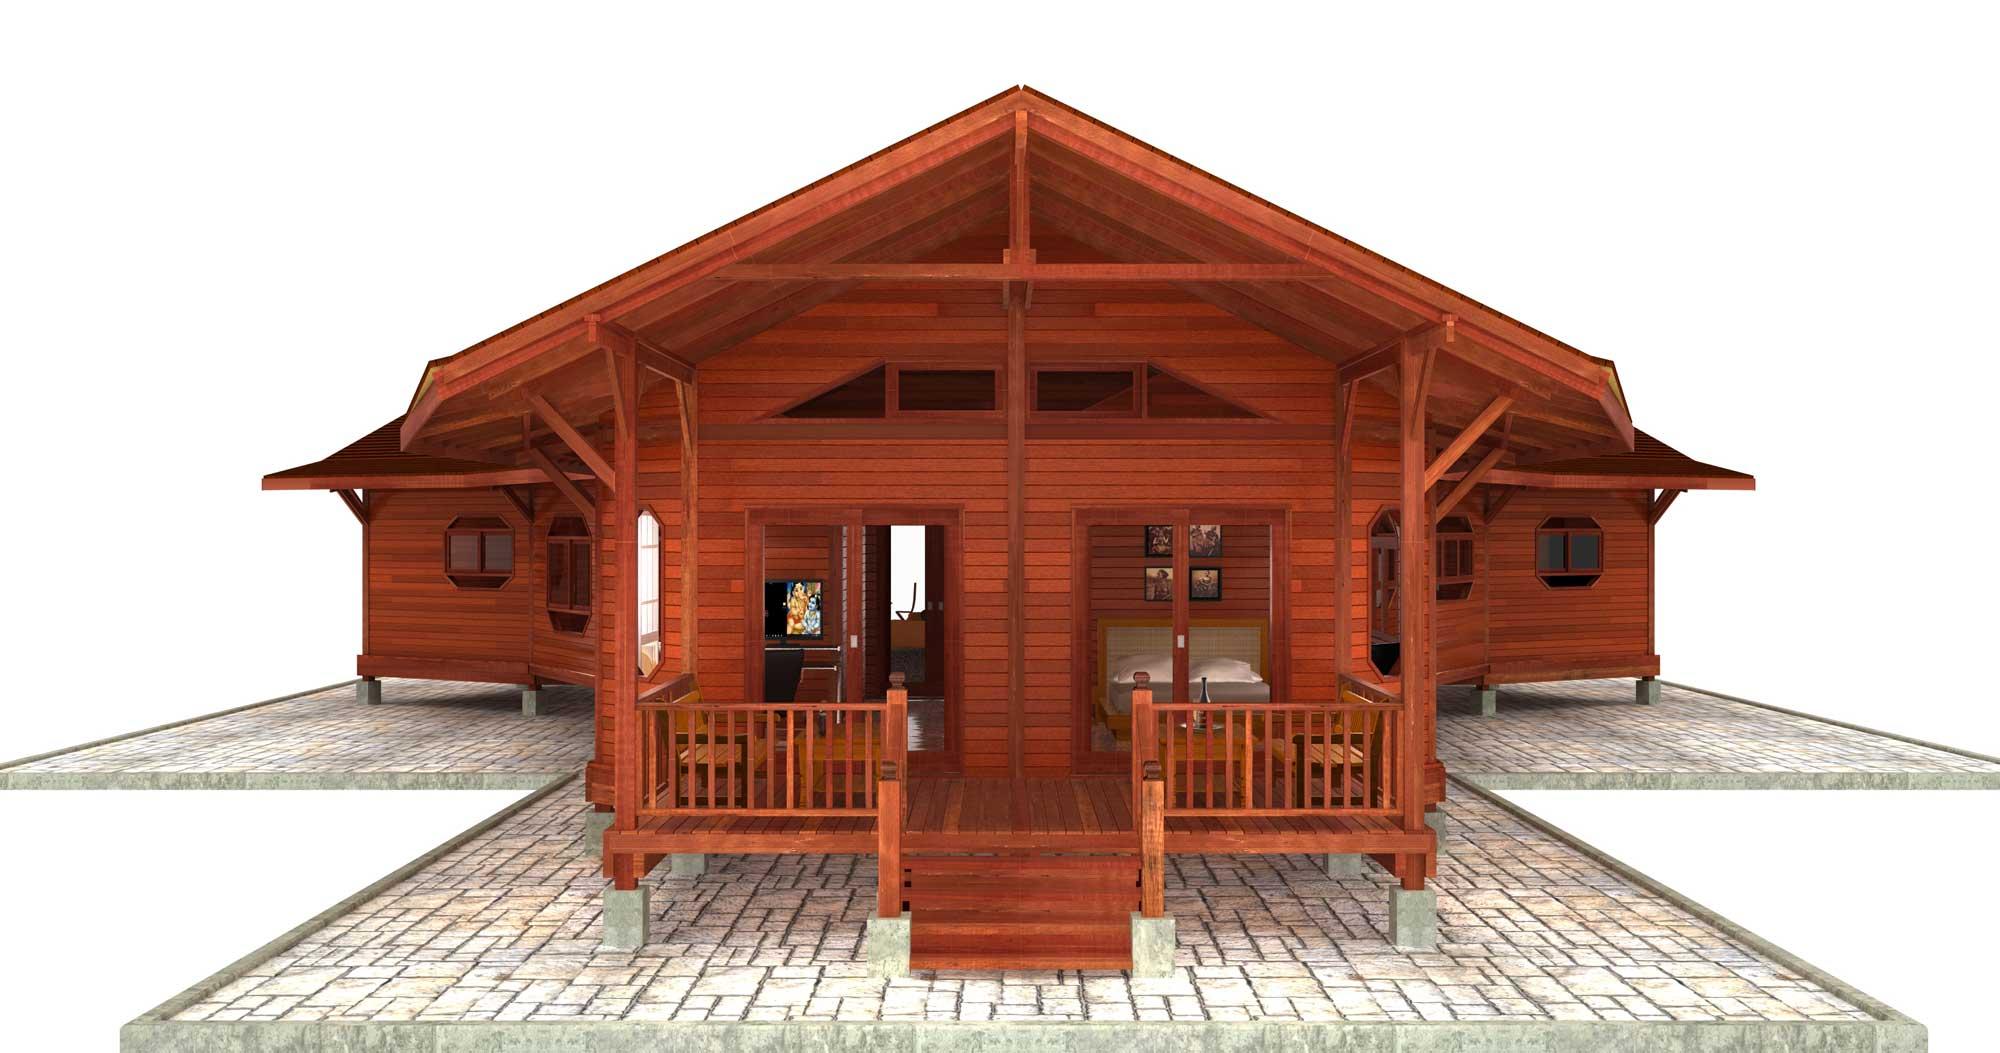 View Floor Plans Of Our Bali Buddha Prefab Home Design